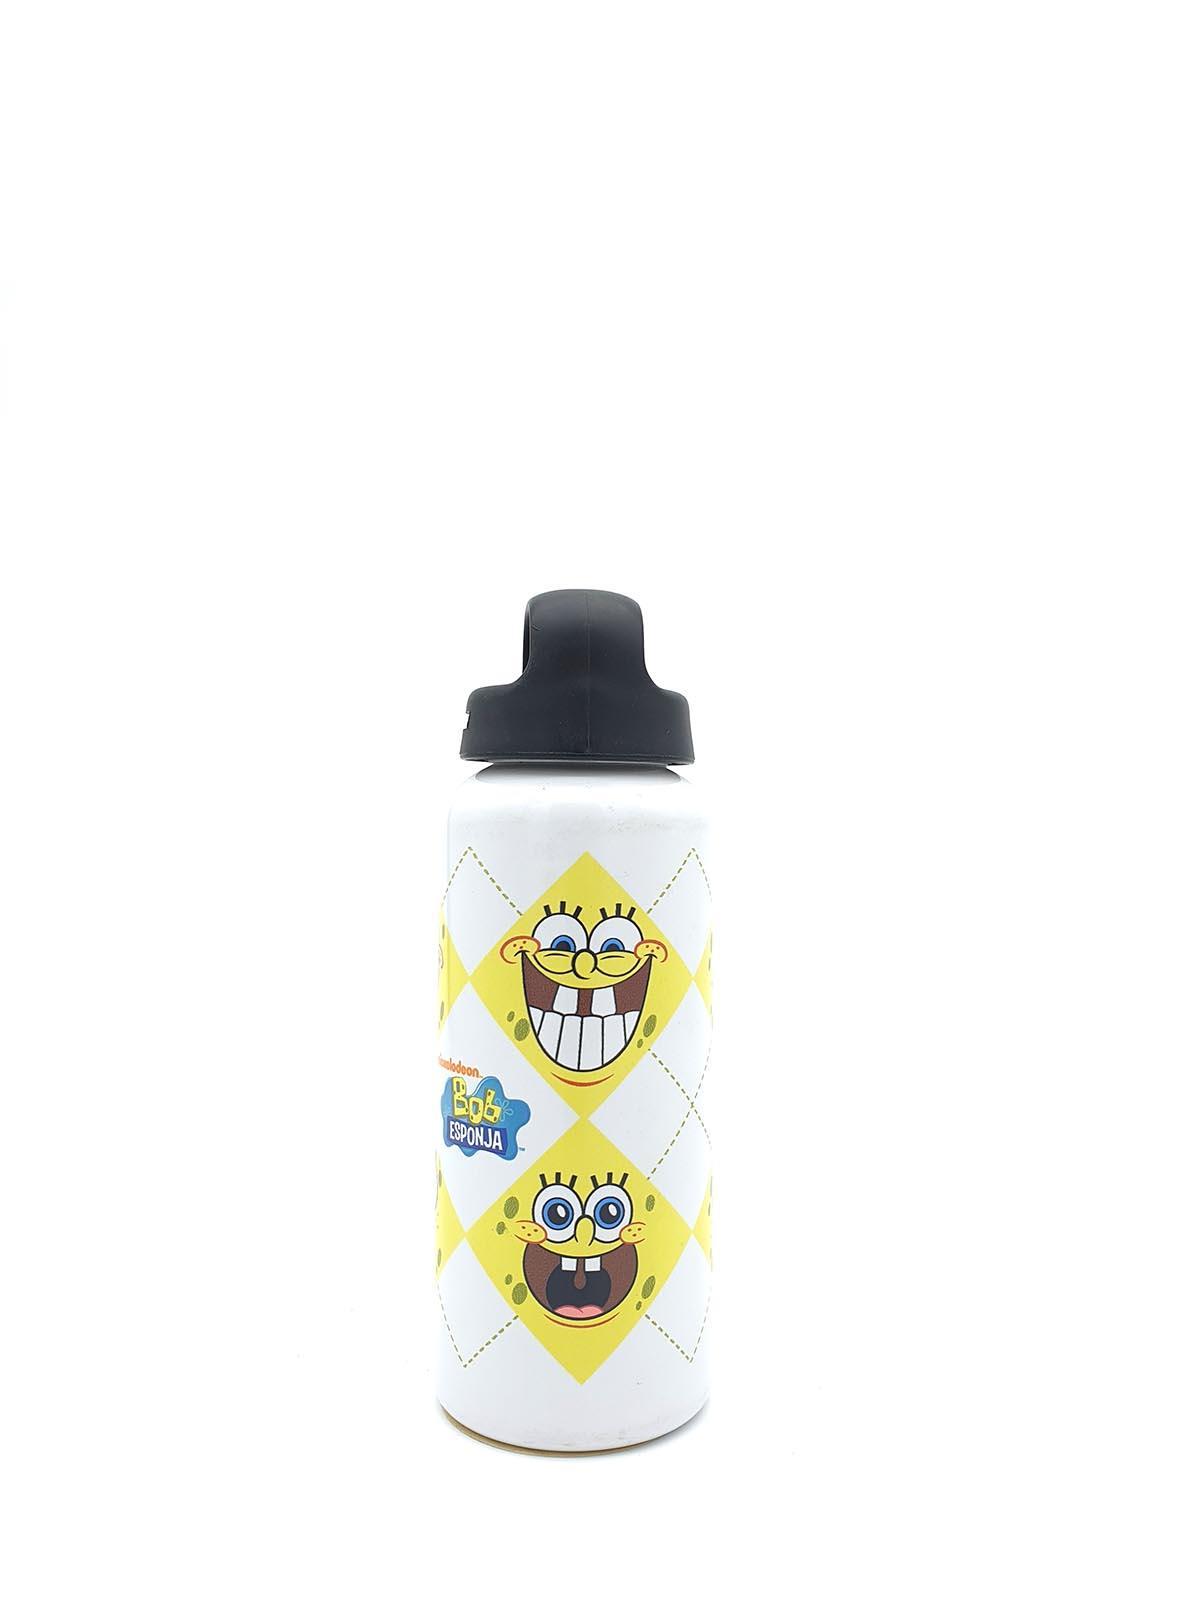 Laken Alüminyum Hit Sponge Bob Şişe 0,45L Rombos Bob Lksb06.45